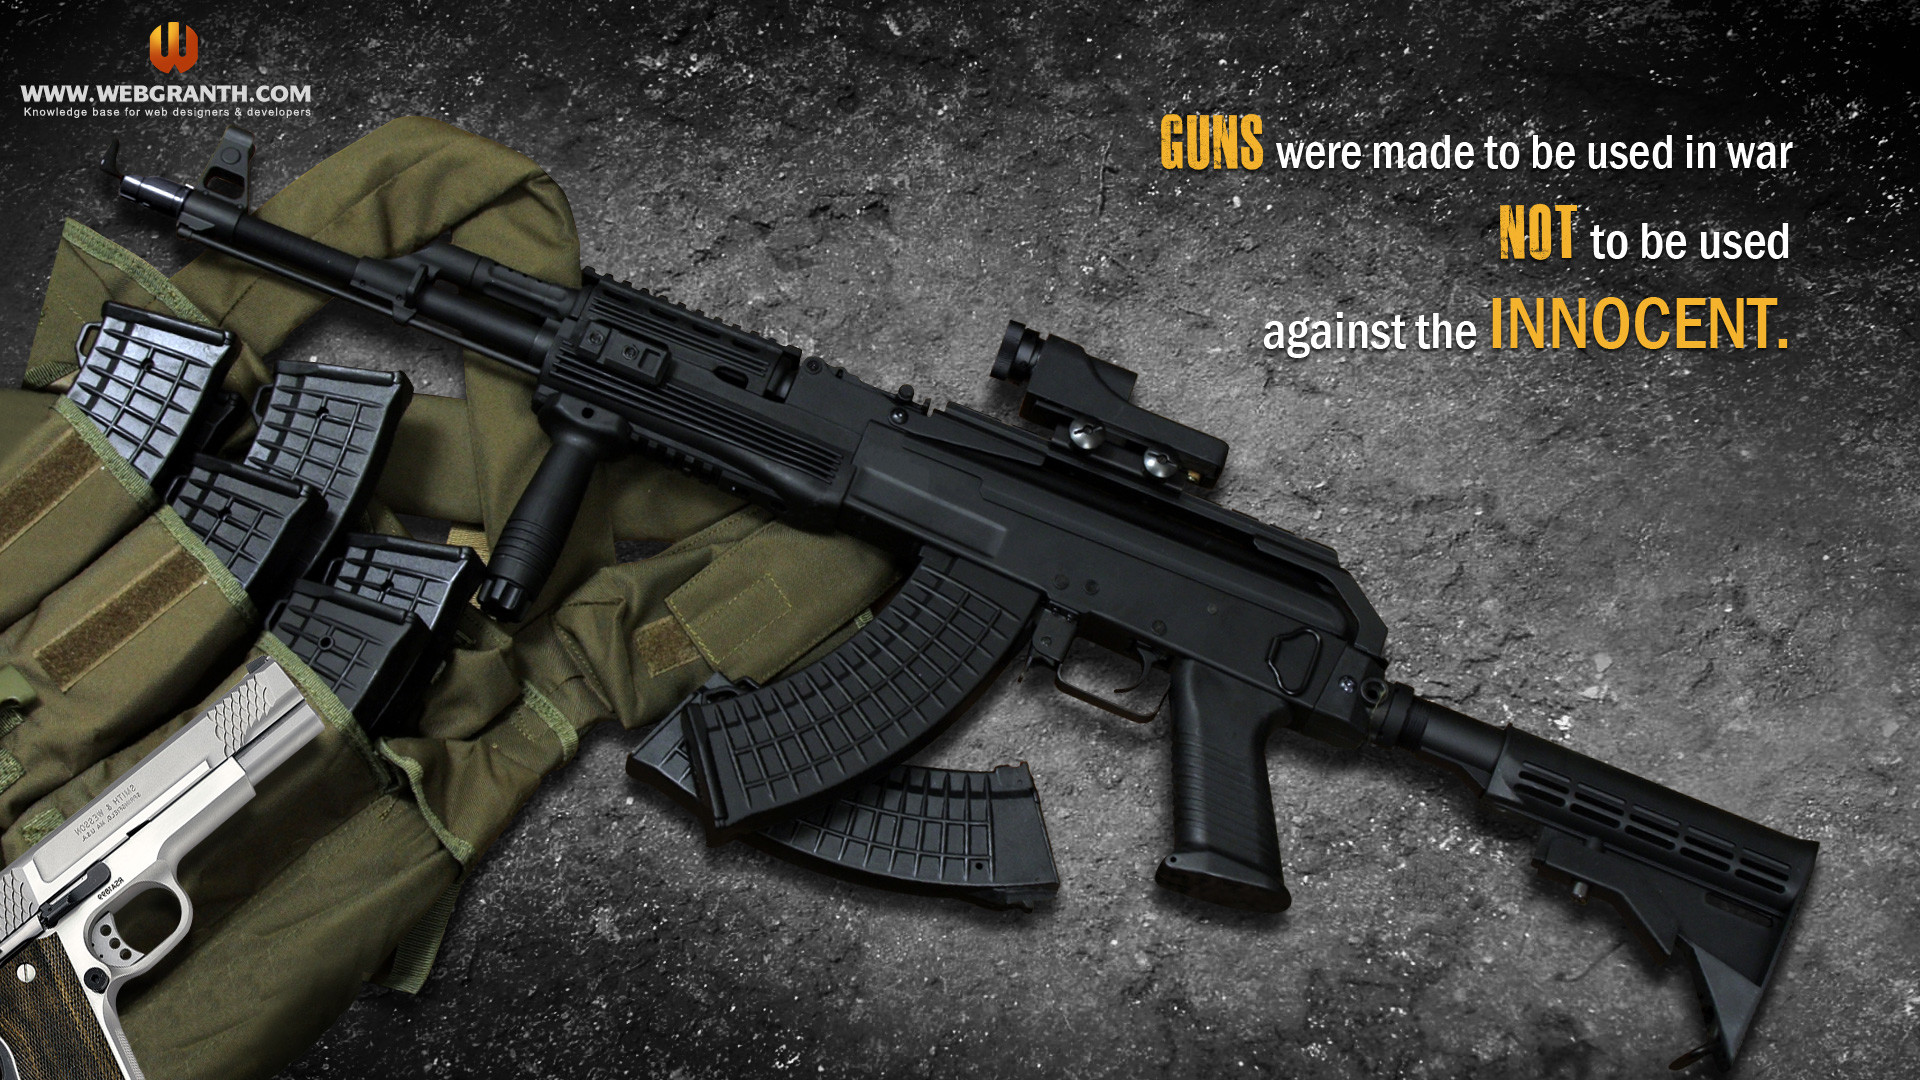 Gun wallpapers and screensavers 62 images - Wallpapers guns free download ...